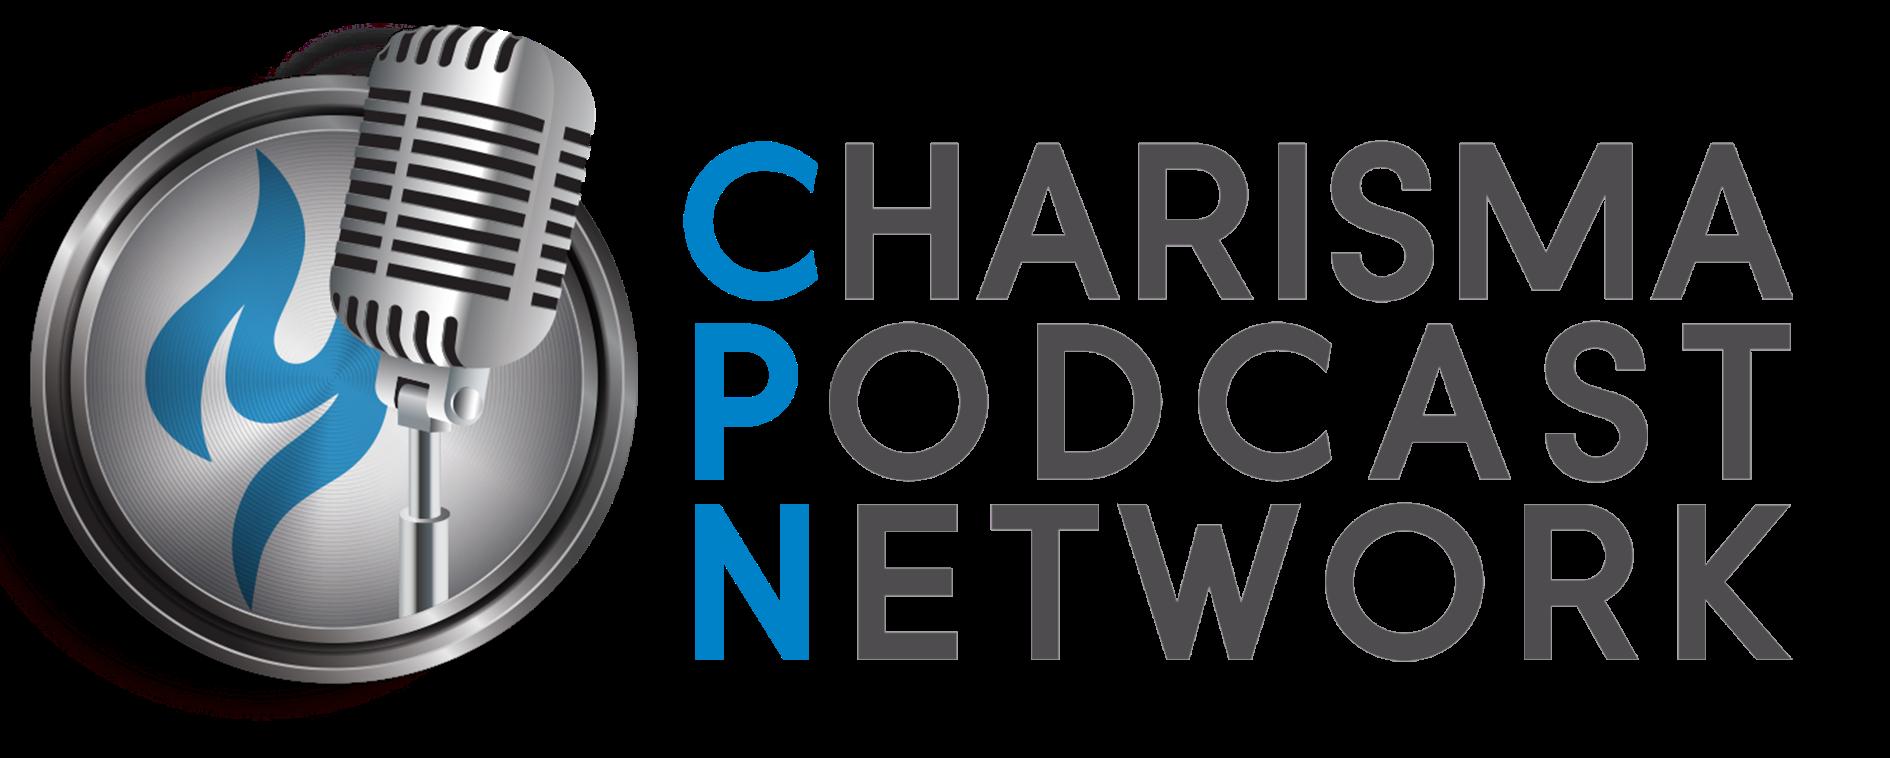 Listen on Charisma Podcast Network